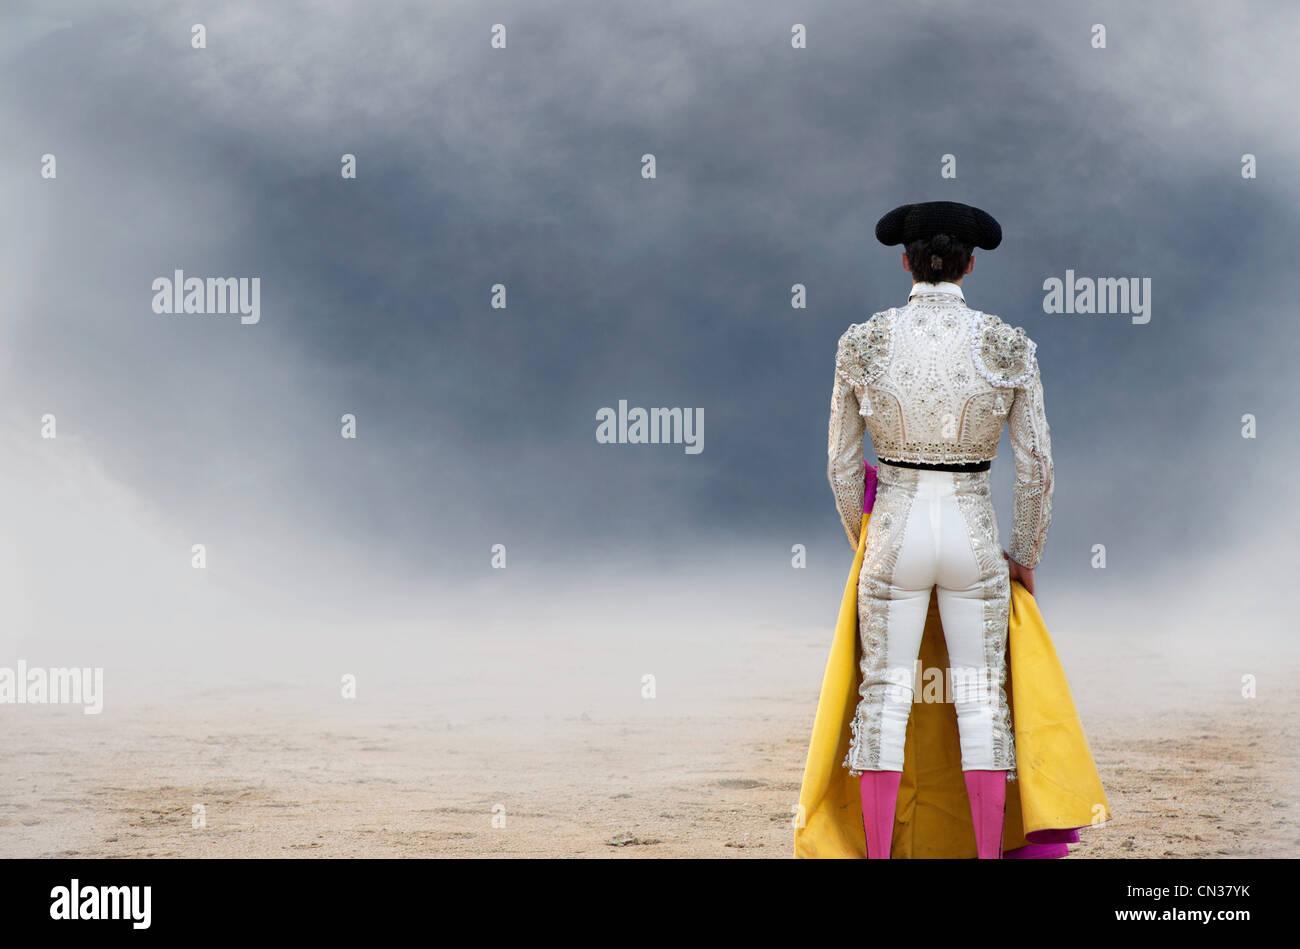 Bullfighter, rear view, Las Ventas bullring, Madrid - Stock Image